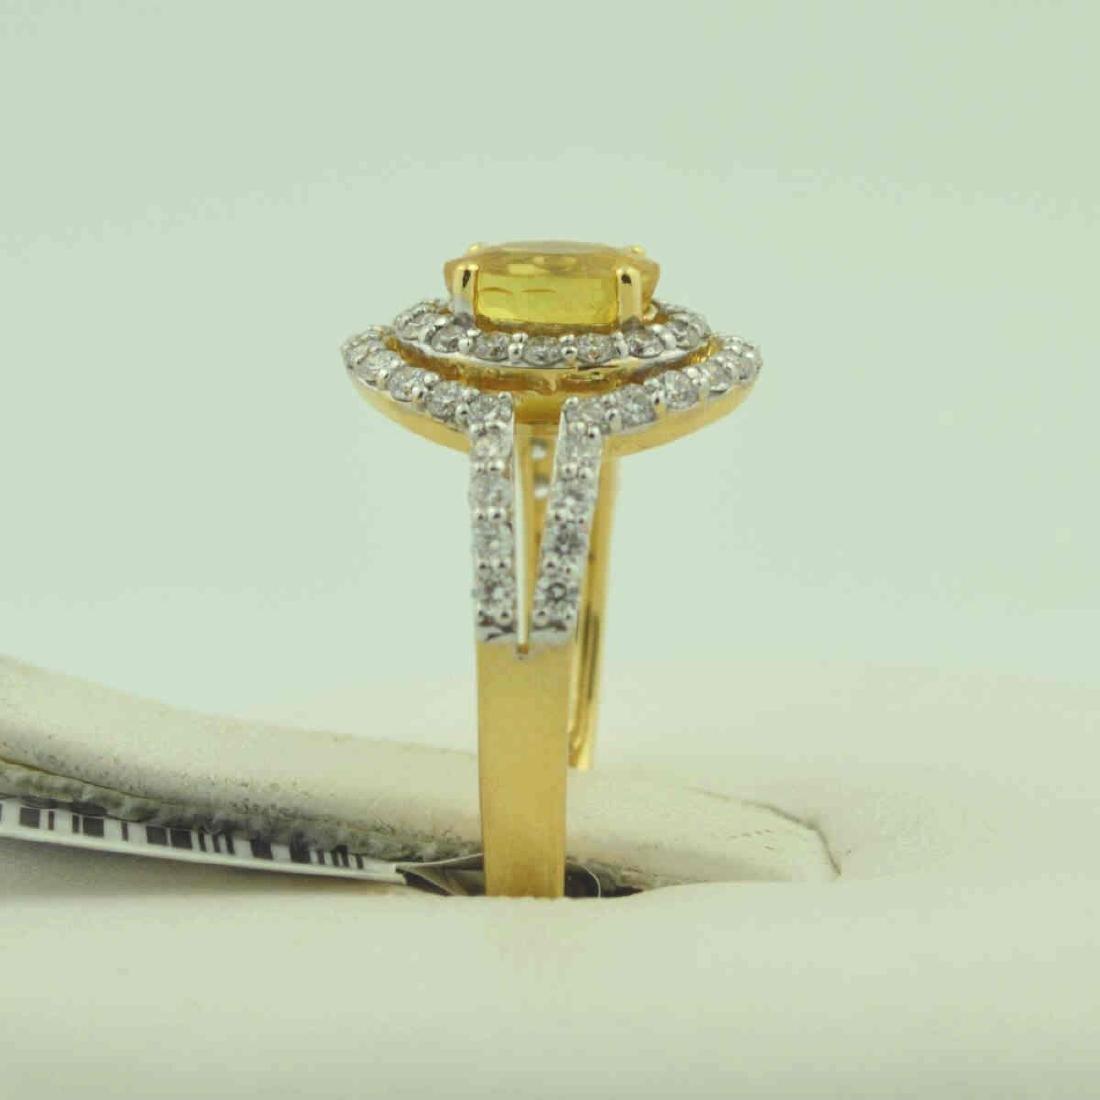 18kt yellow gold yellow sapphire ring - 4